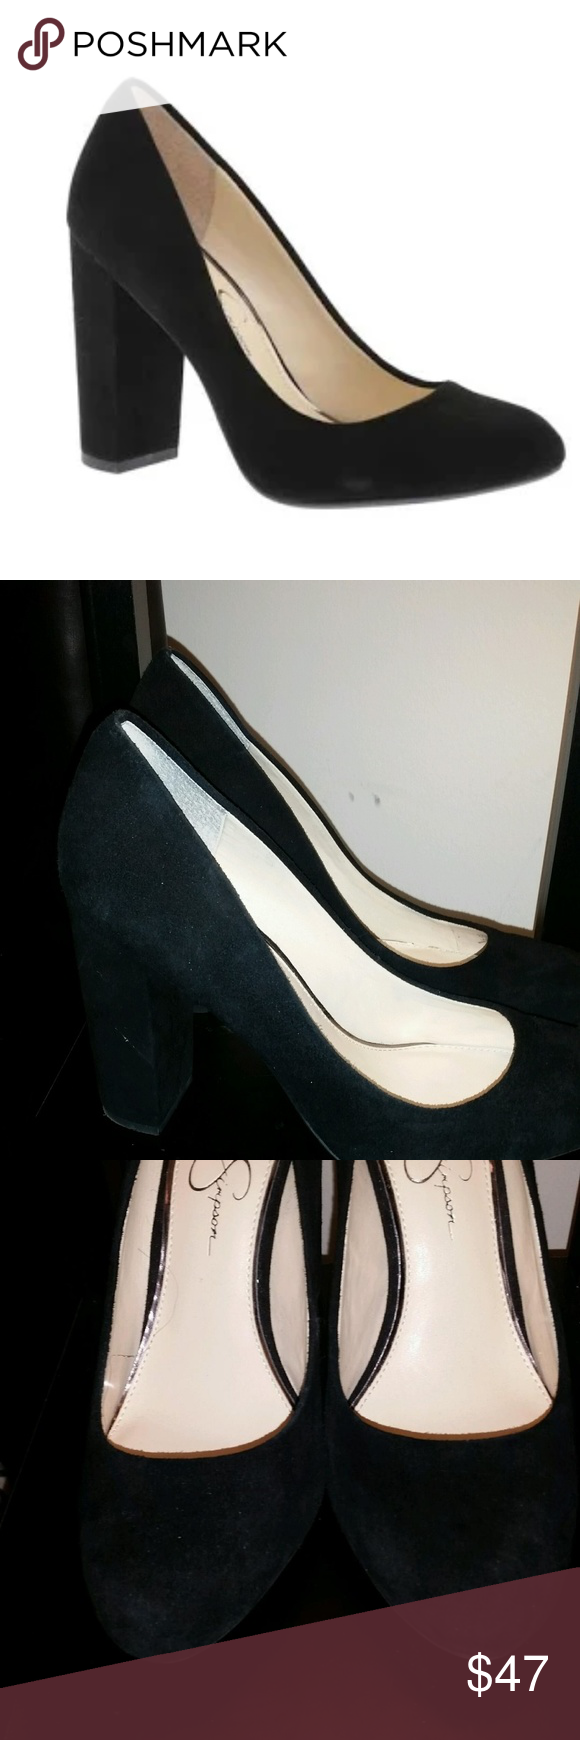 889195c31b8 Jessica Simpson Belemo Pump (Women) Like new Jessica Simpson Belemo Pump  (Women) Jessica Simpson Shoes Heels